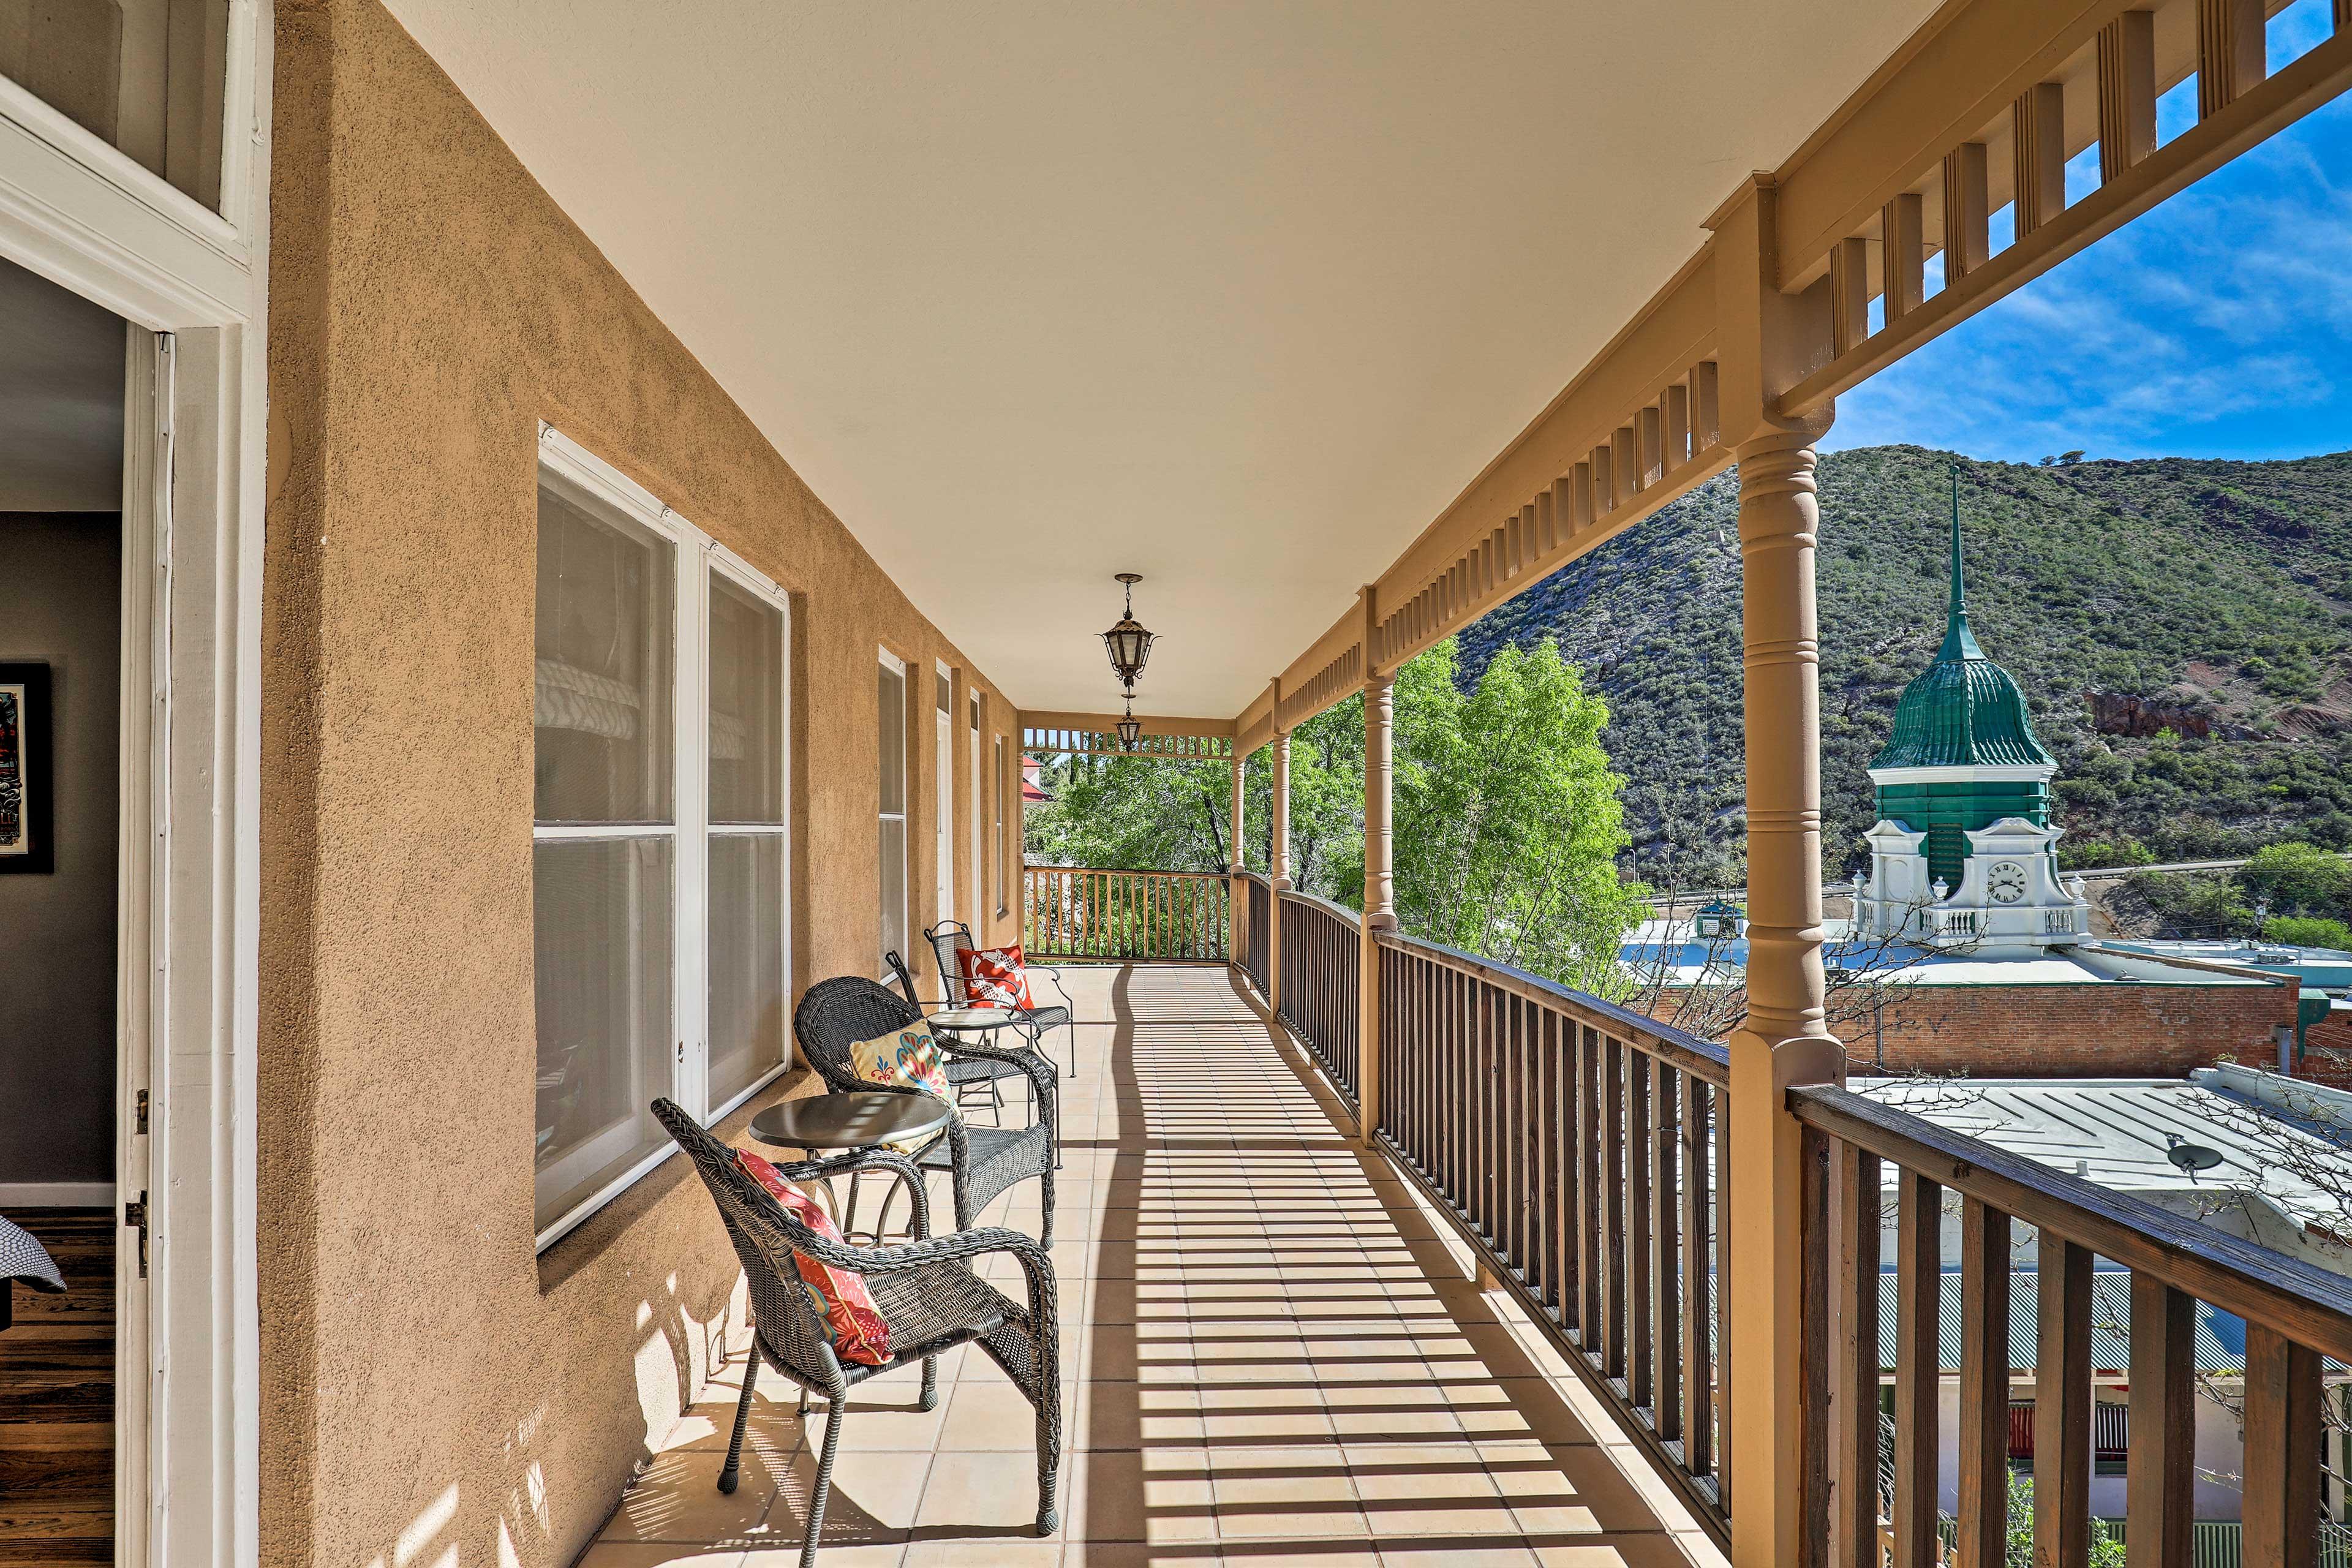 Soak up the sun on the balcony.